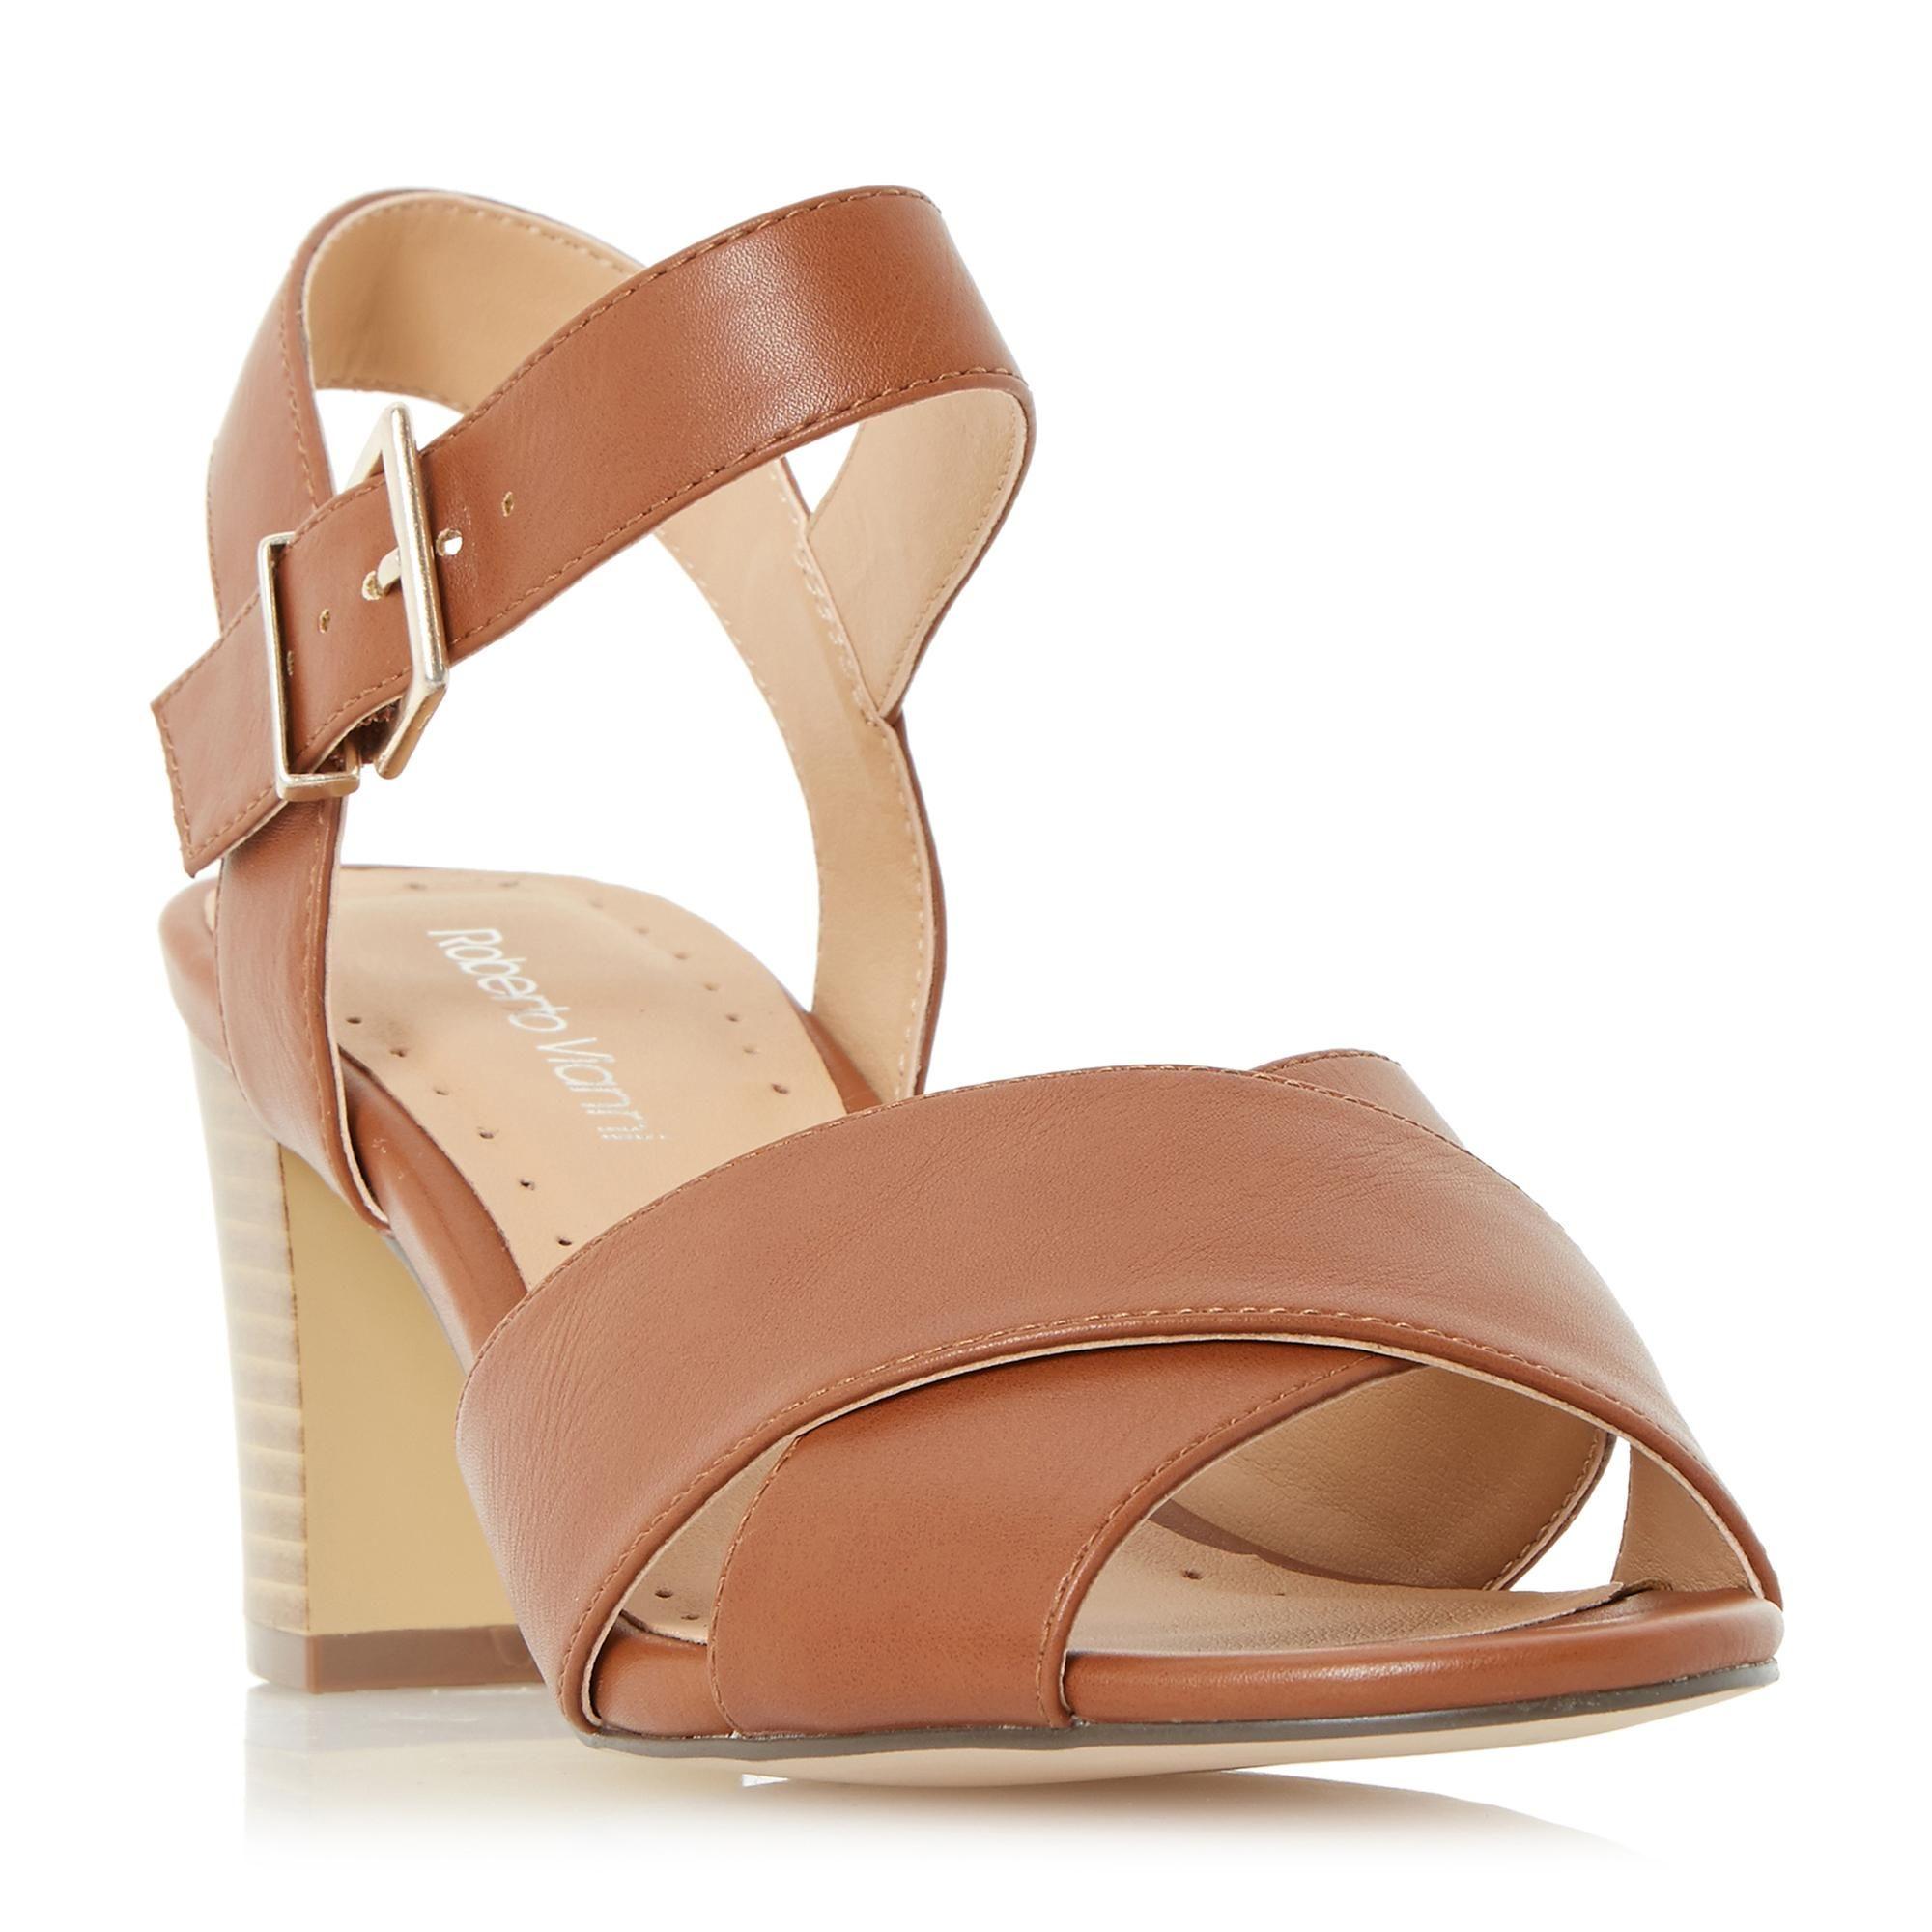 62f031163e4 ROBERTO VIANNI LADIES JERSIE - Cross Strap Mid Heel Sandal - tan ...